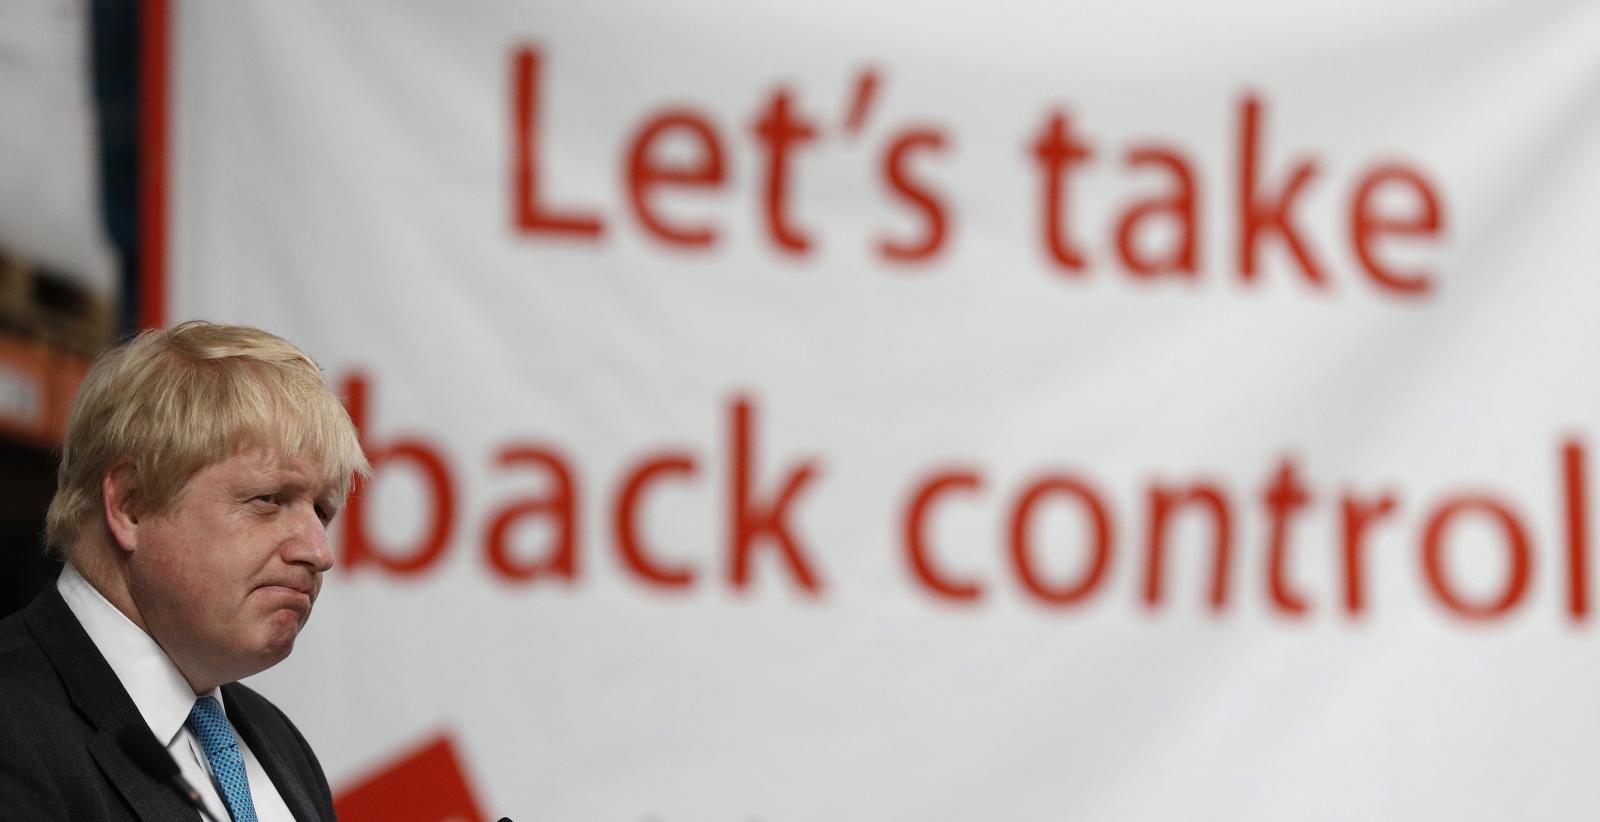 boris johnson eu referendum 2016